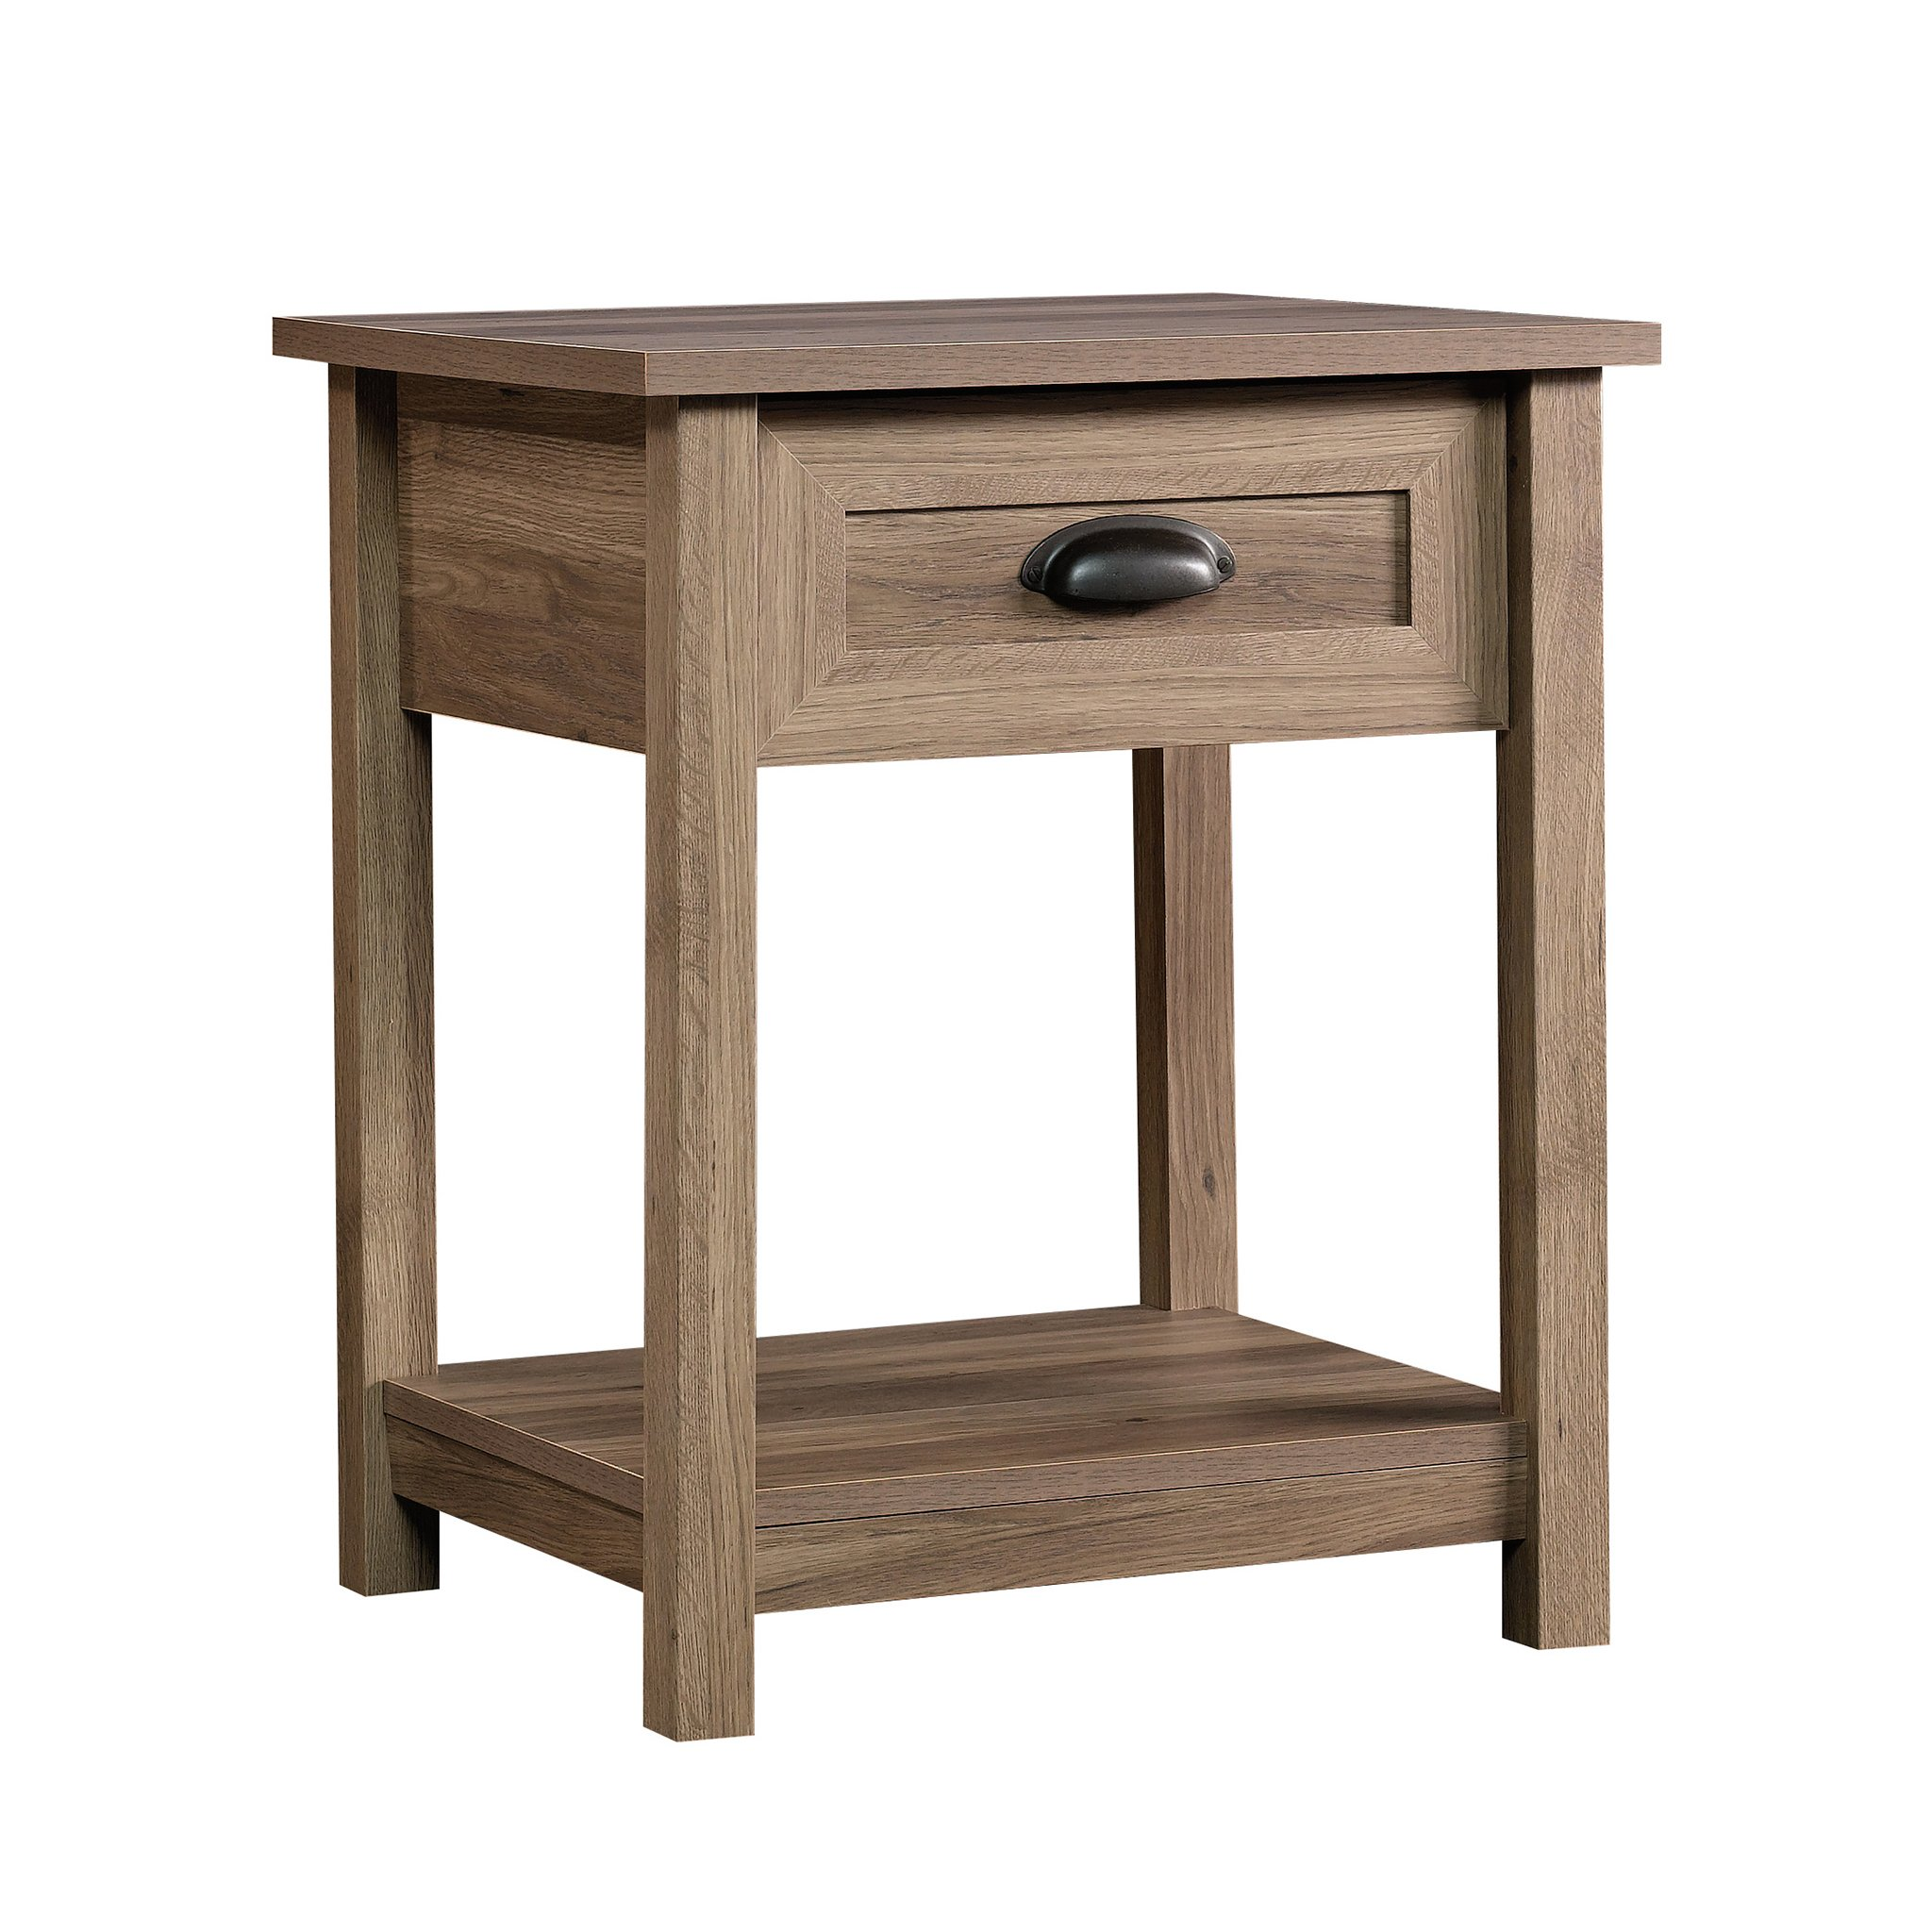 Sauder 417771 Table, Salt Oak